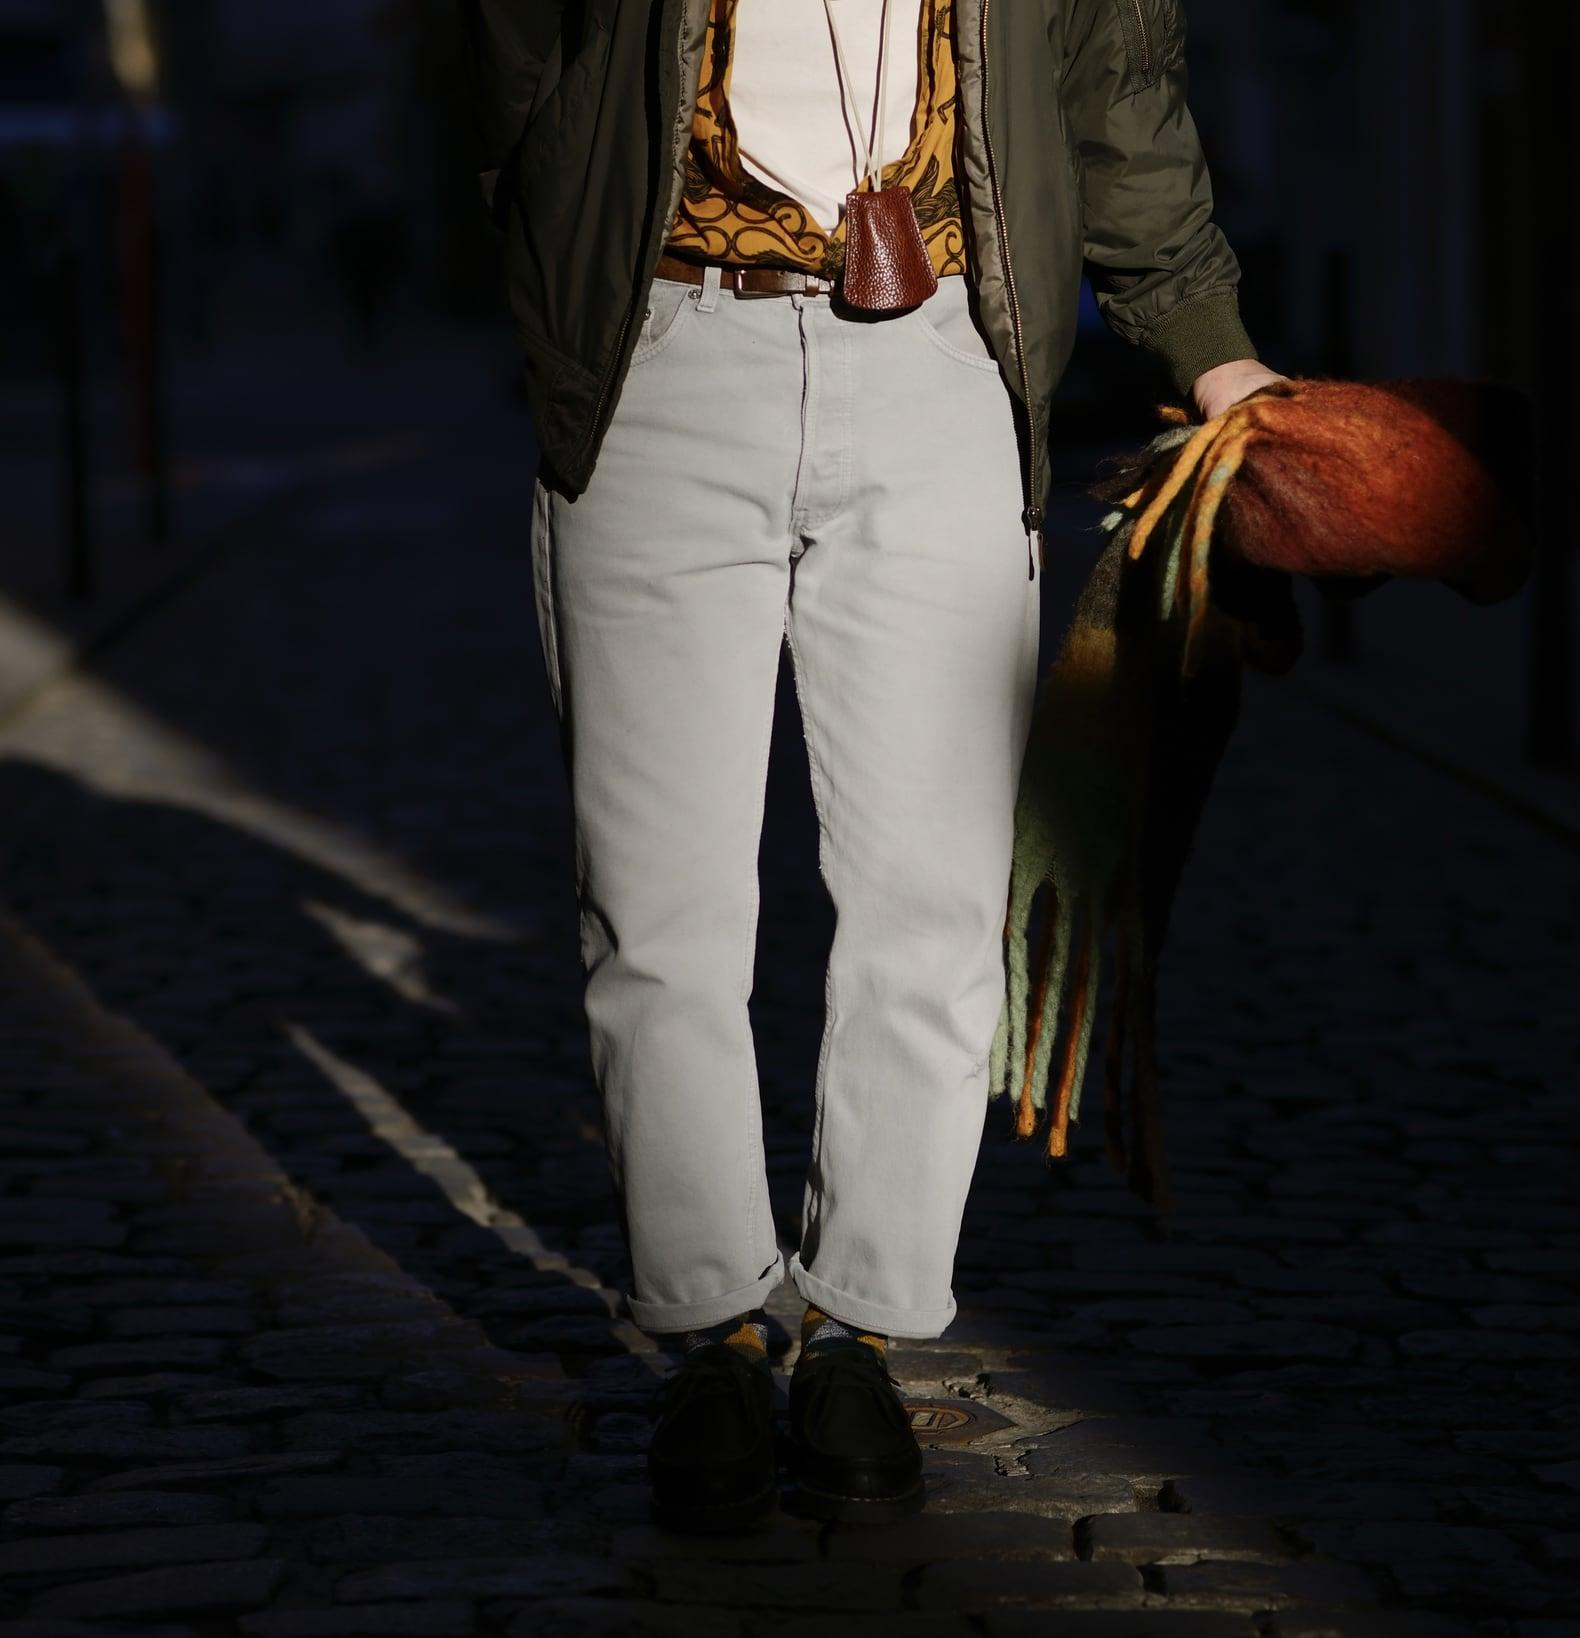 jean blan homme avec paraboot